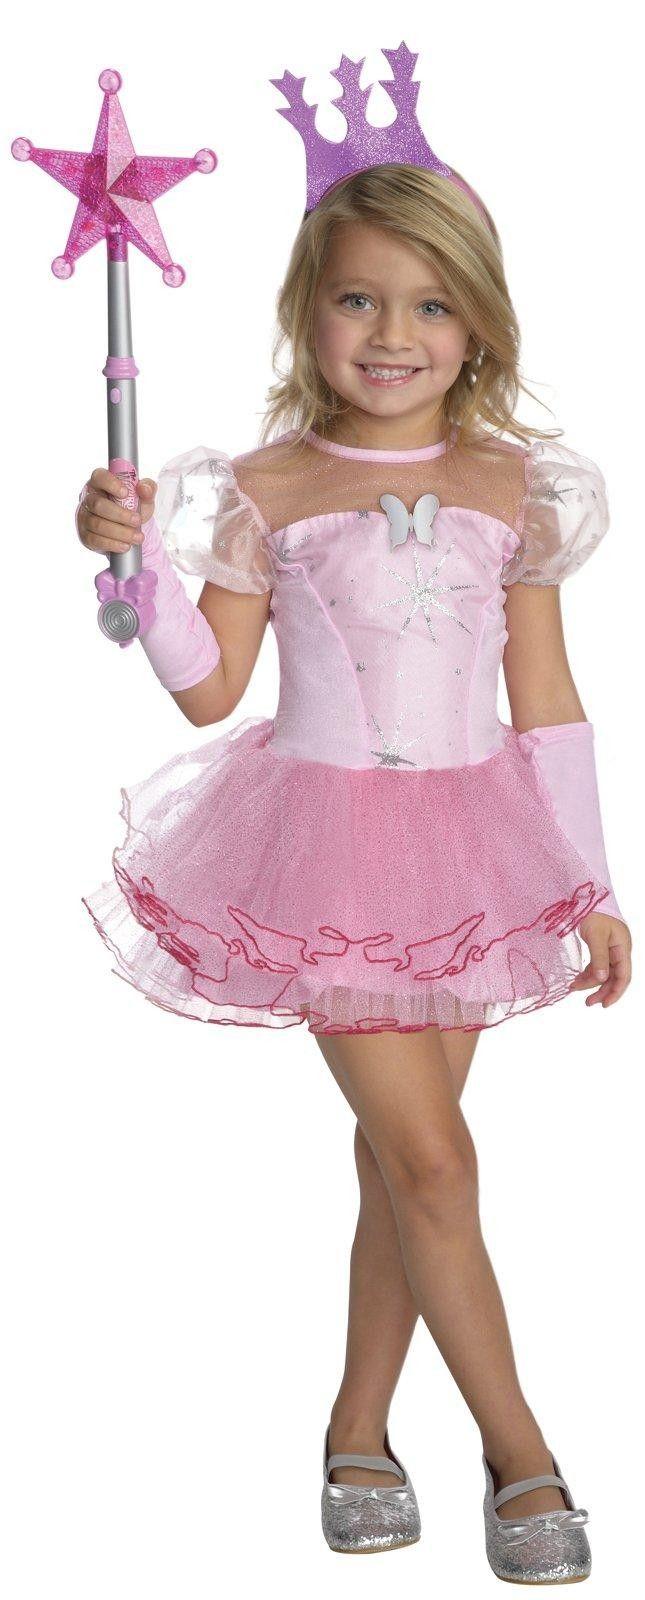 Wizard of Oz - Glinda Tutu Girls Girl's Costume | The Wizard of Oz ...